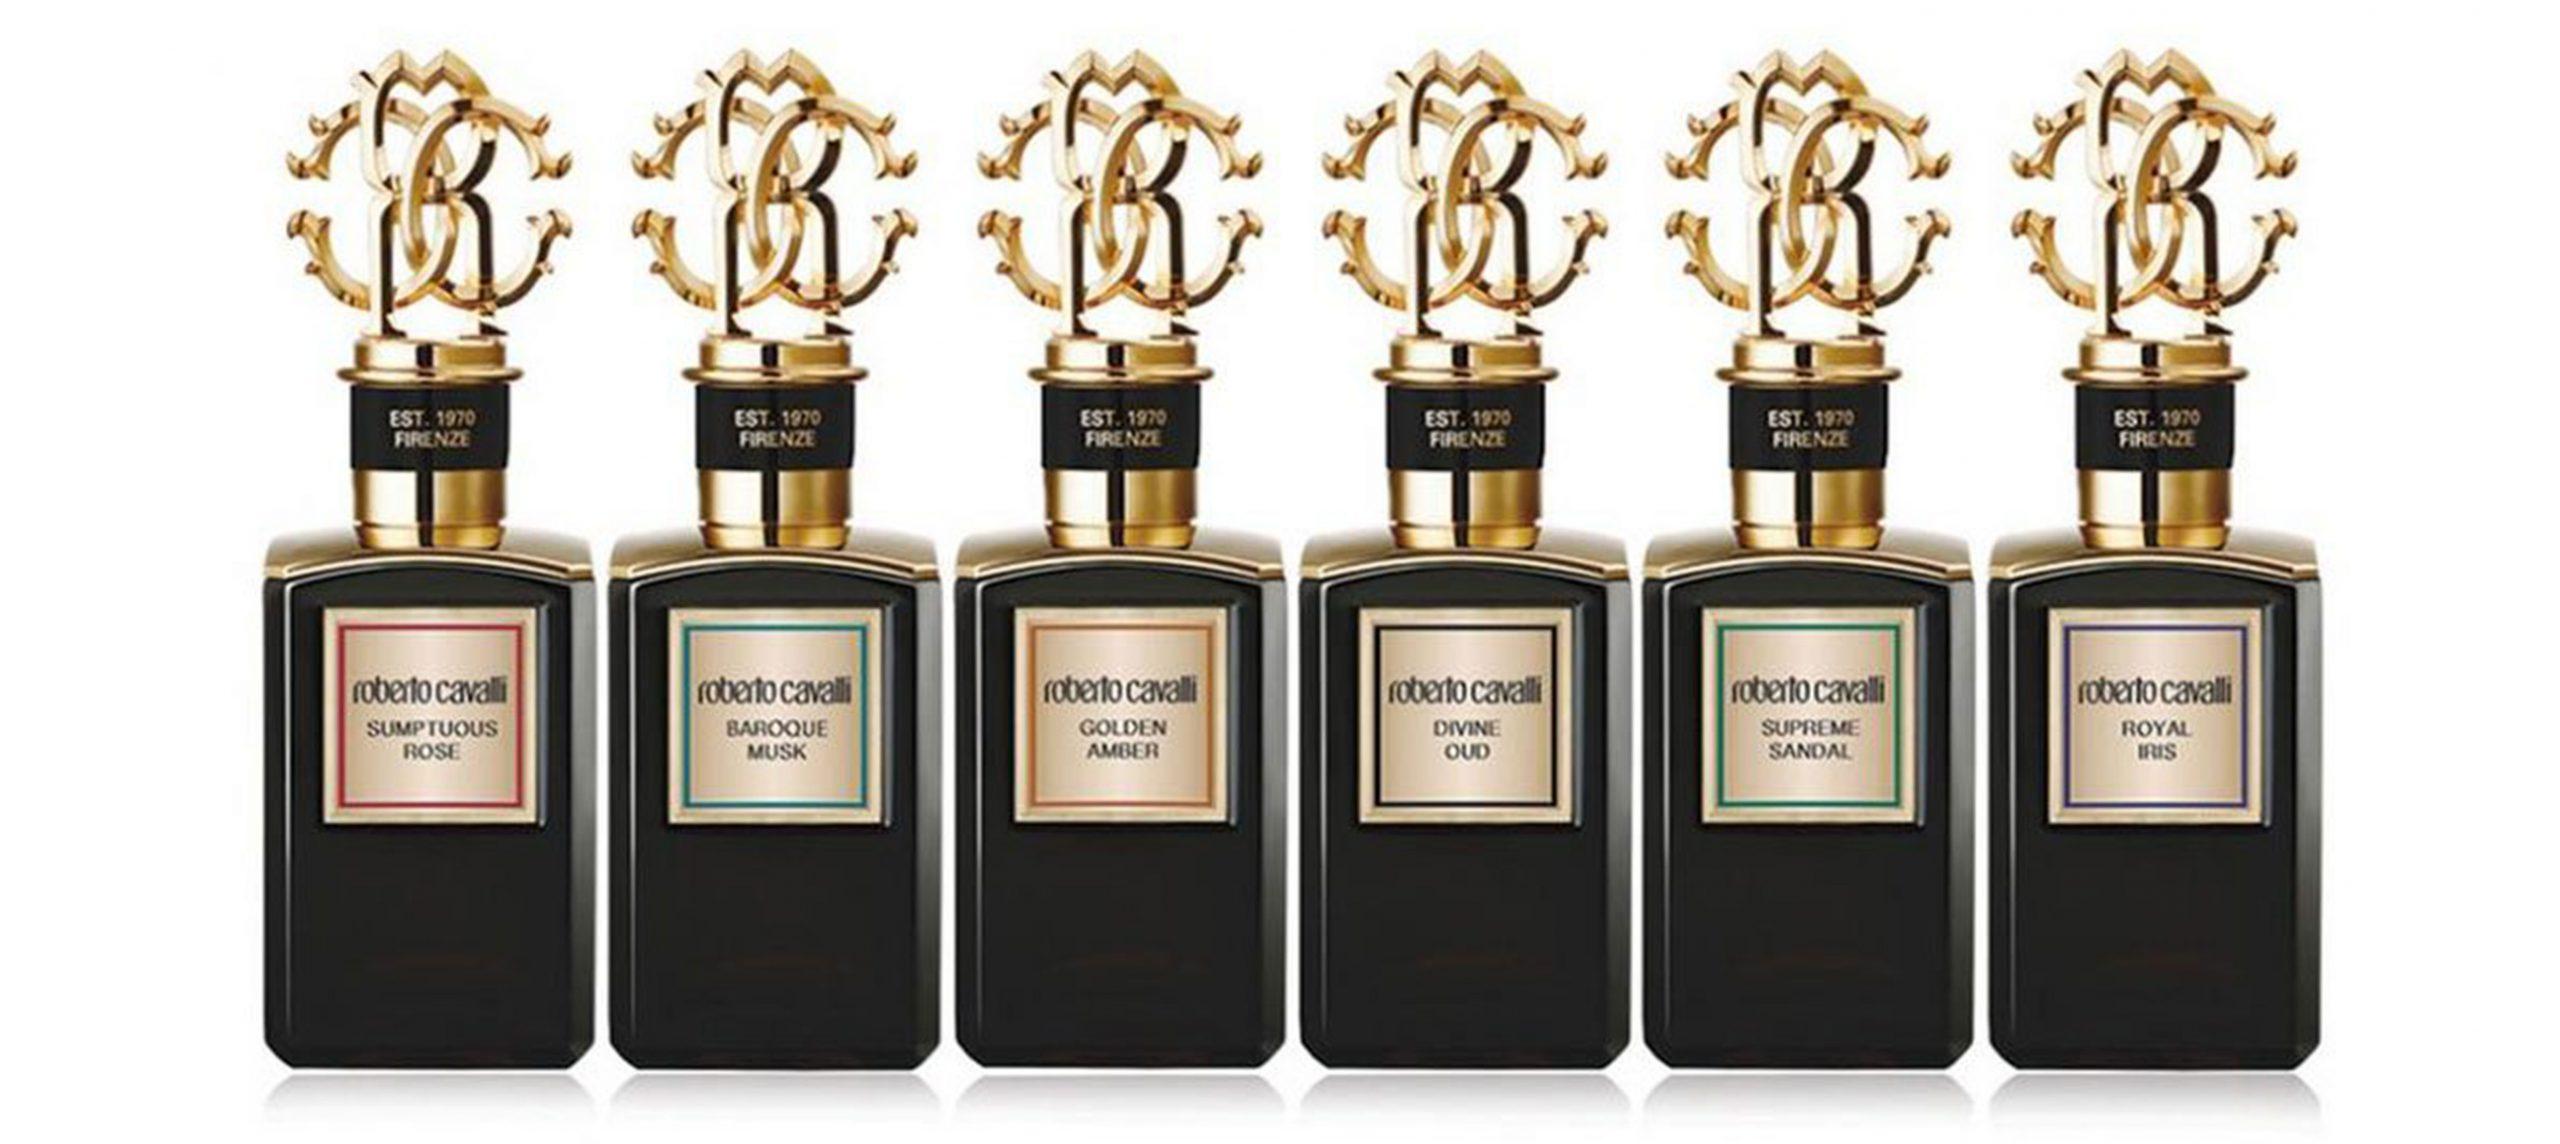 روبرتو کاوالی باروک ماسک تحت کلکسیون Gold Collection روانه بازار شد